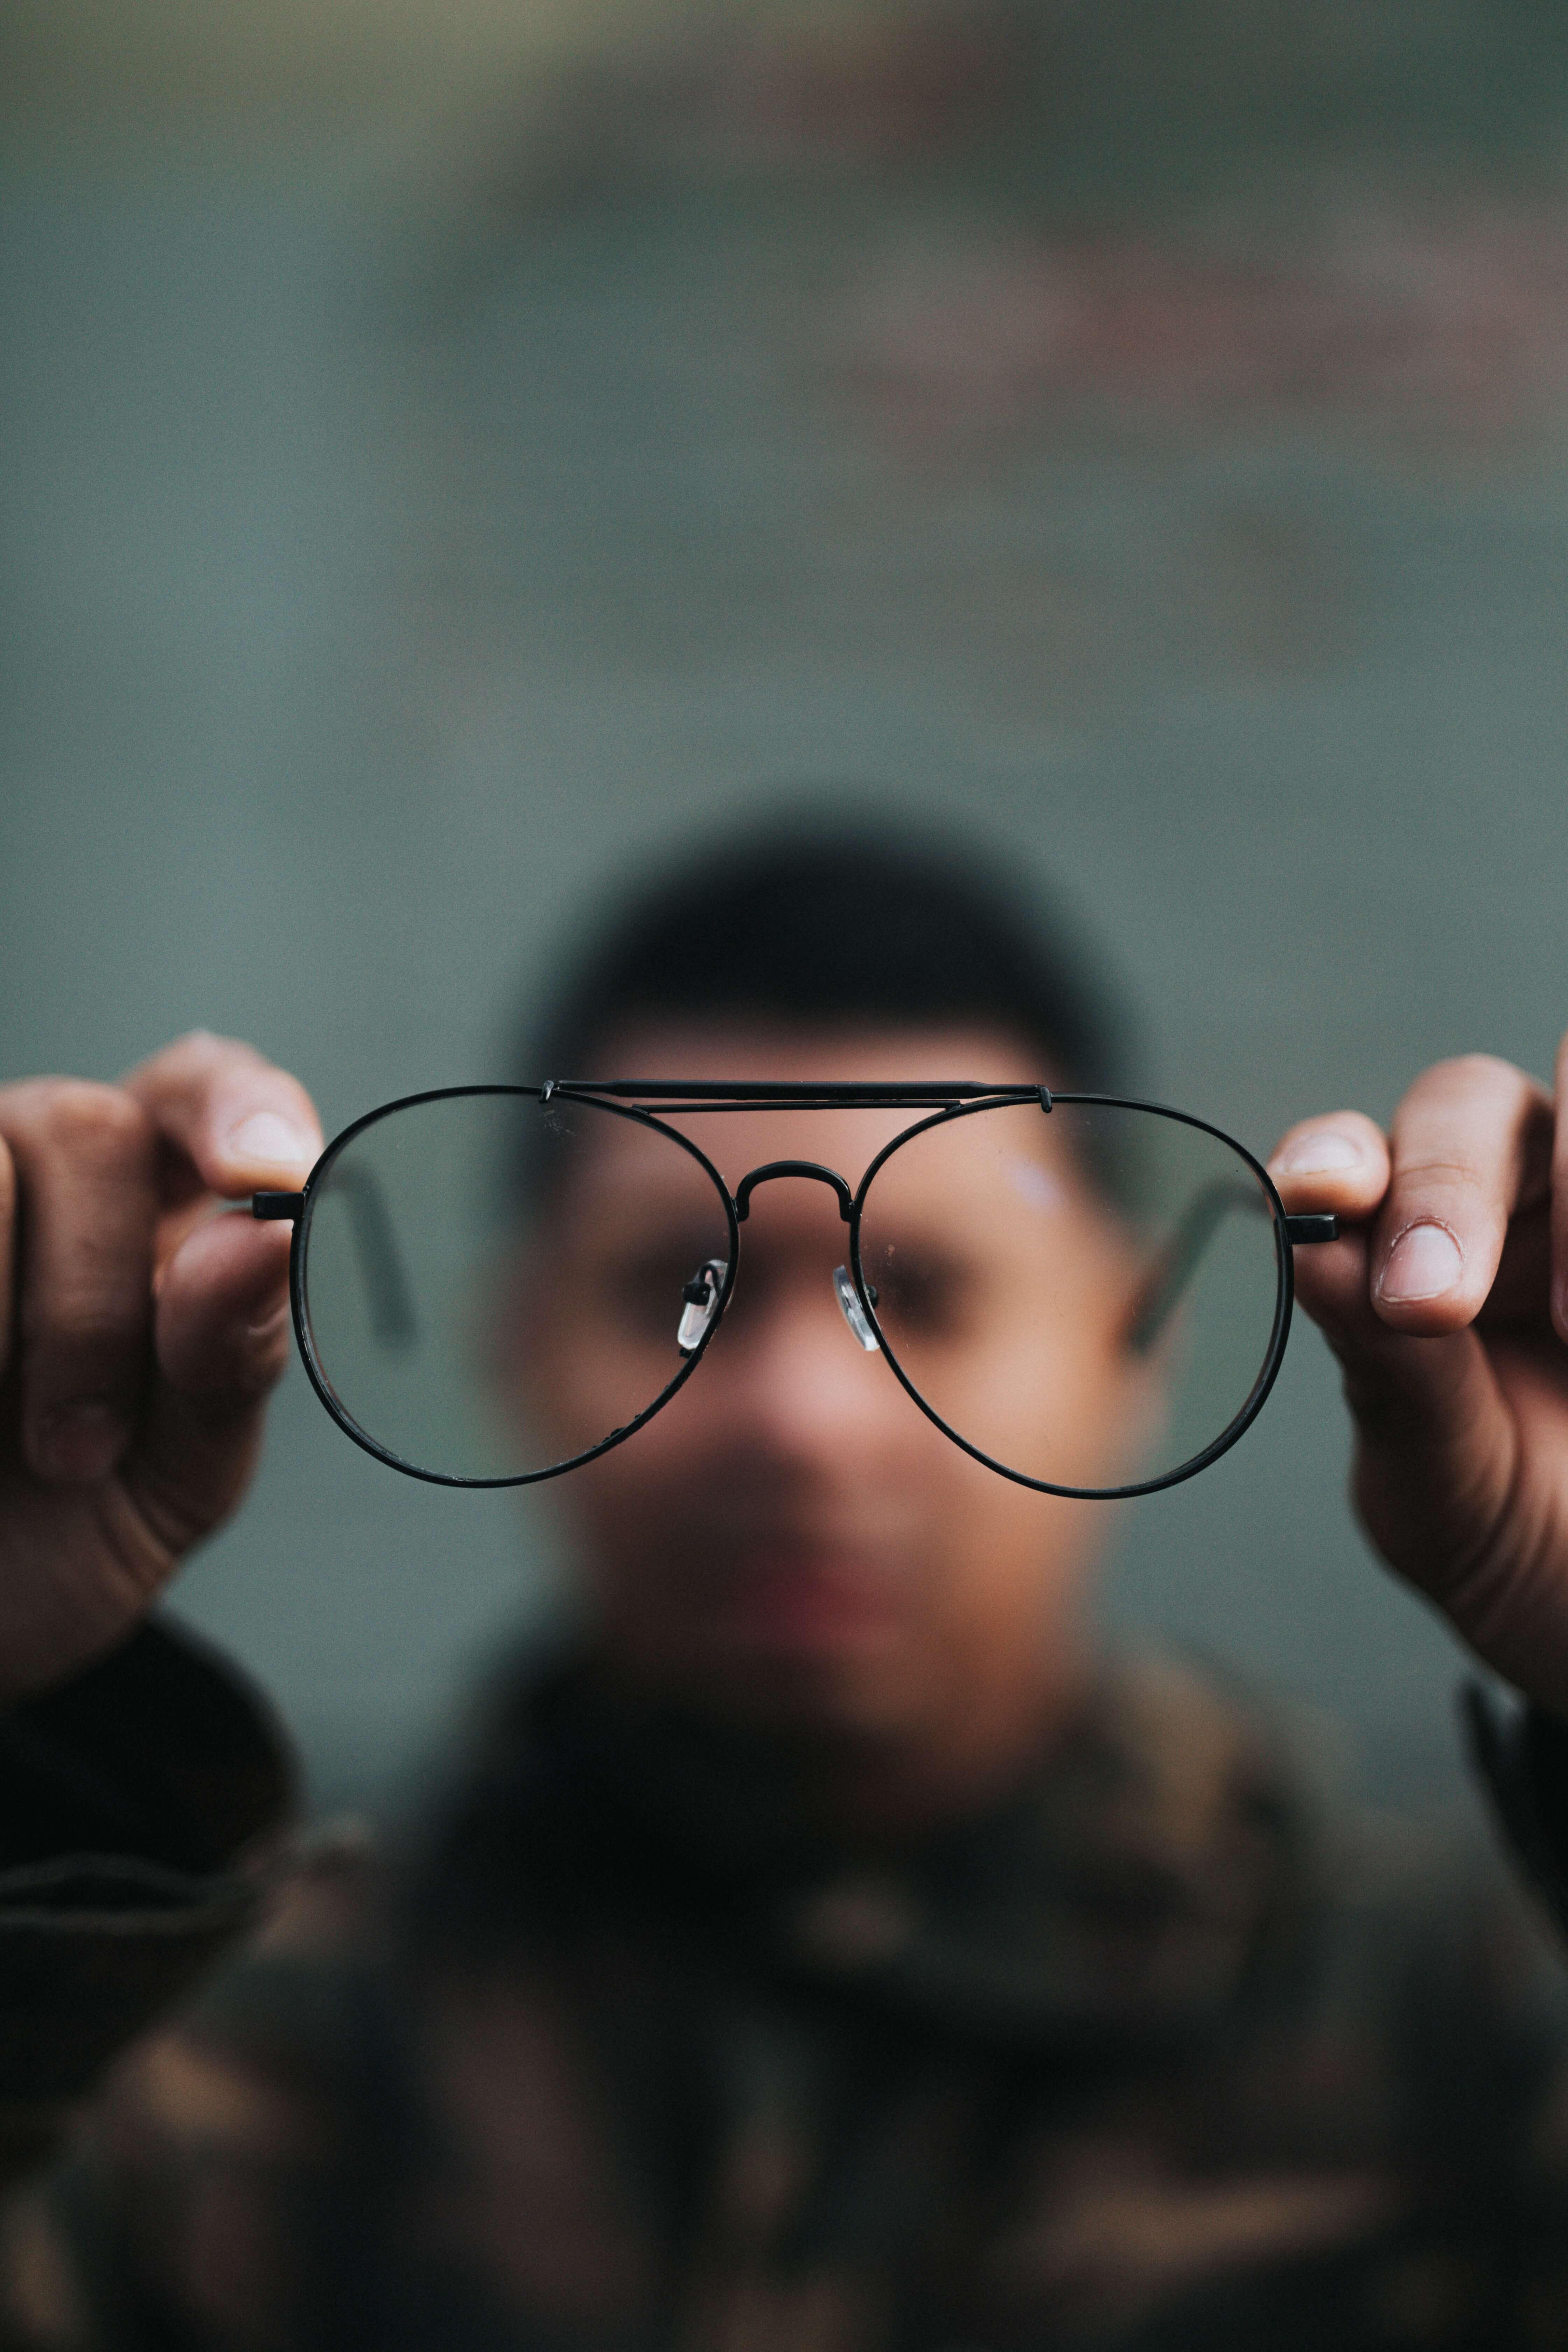 Man looks through steamed glasses